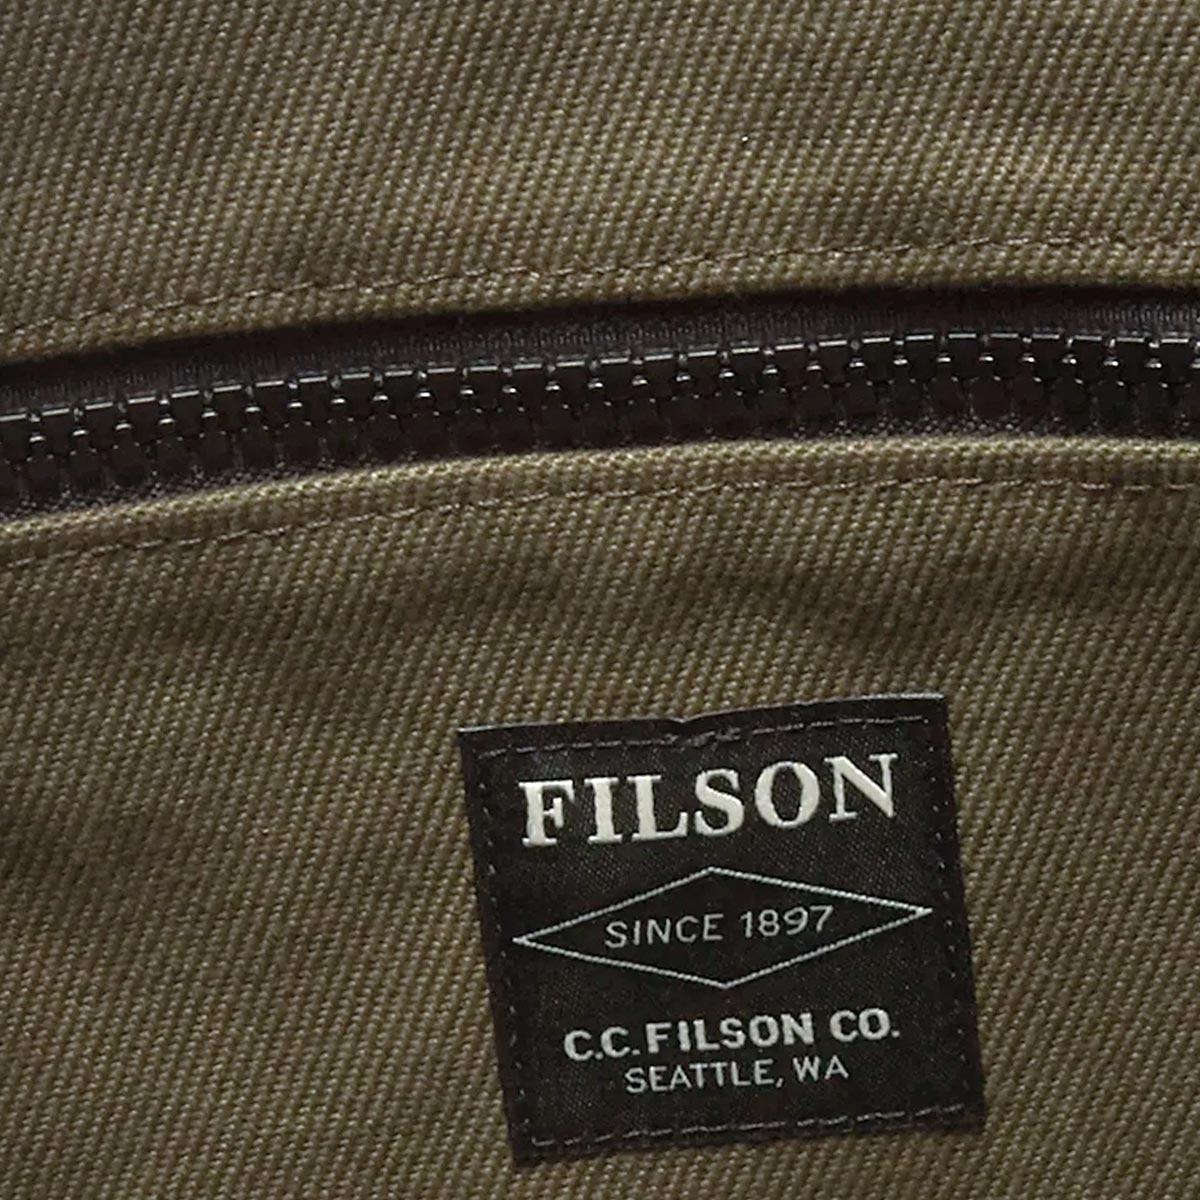 Filson Ranger Backpack 20137828 Otter Green a rugged, vintage inspired, backpack